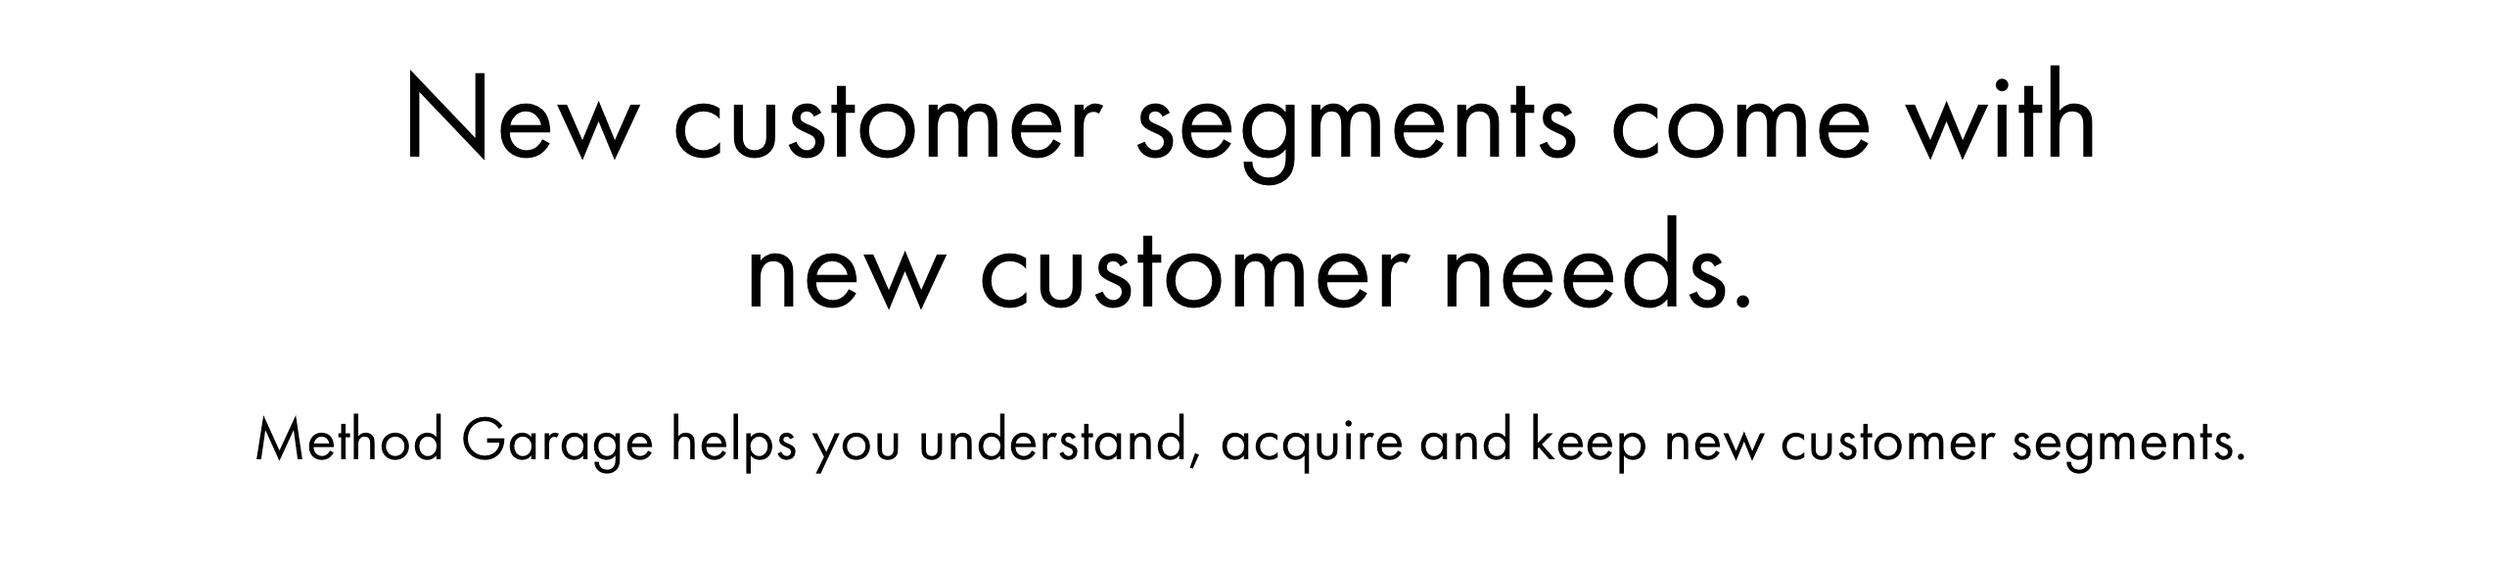 New customer segments.jpg